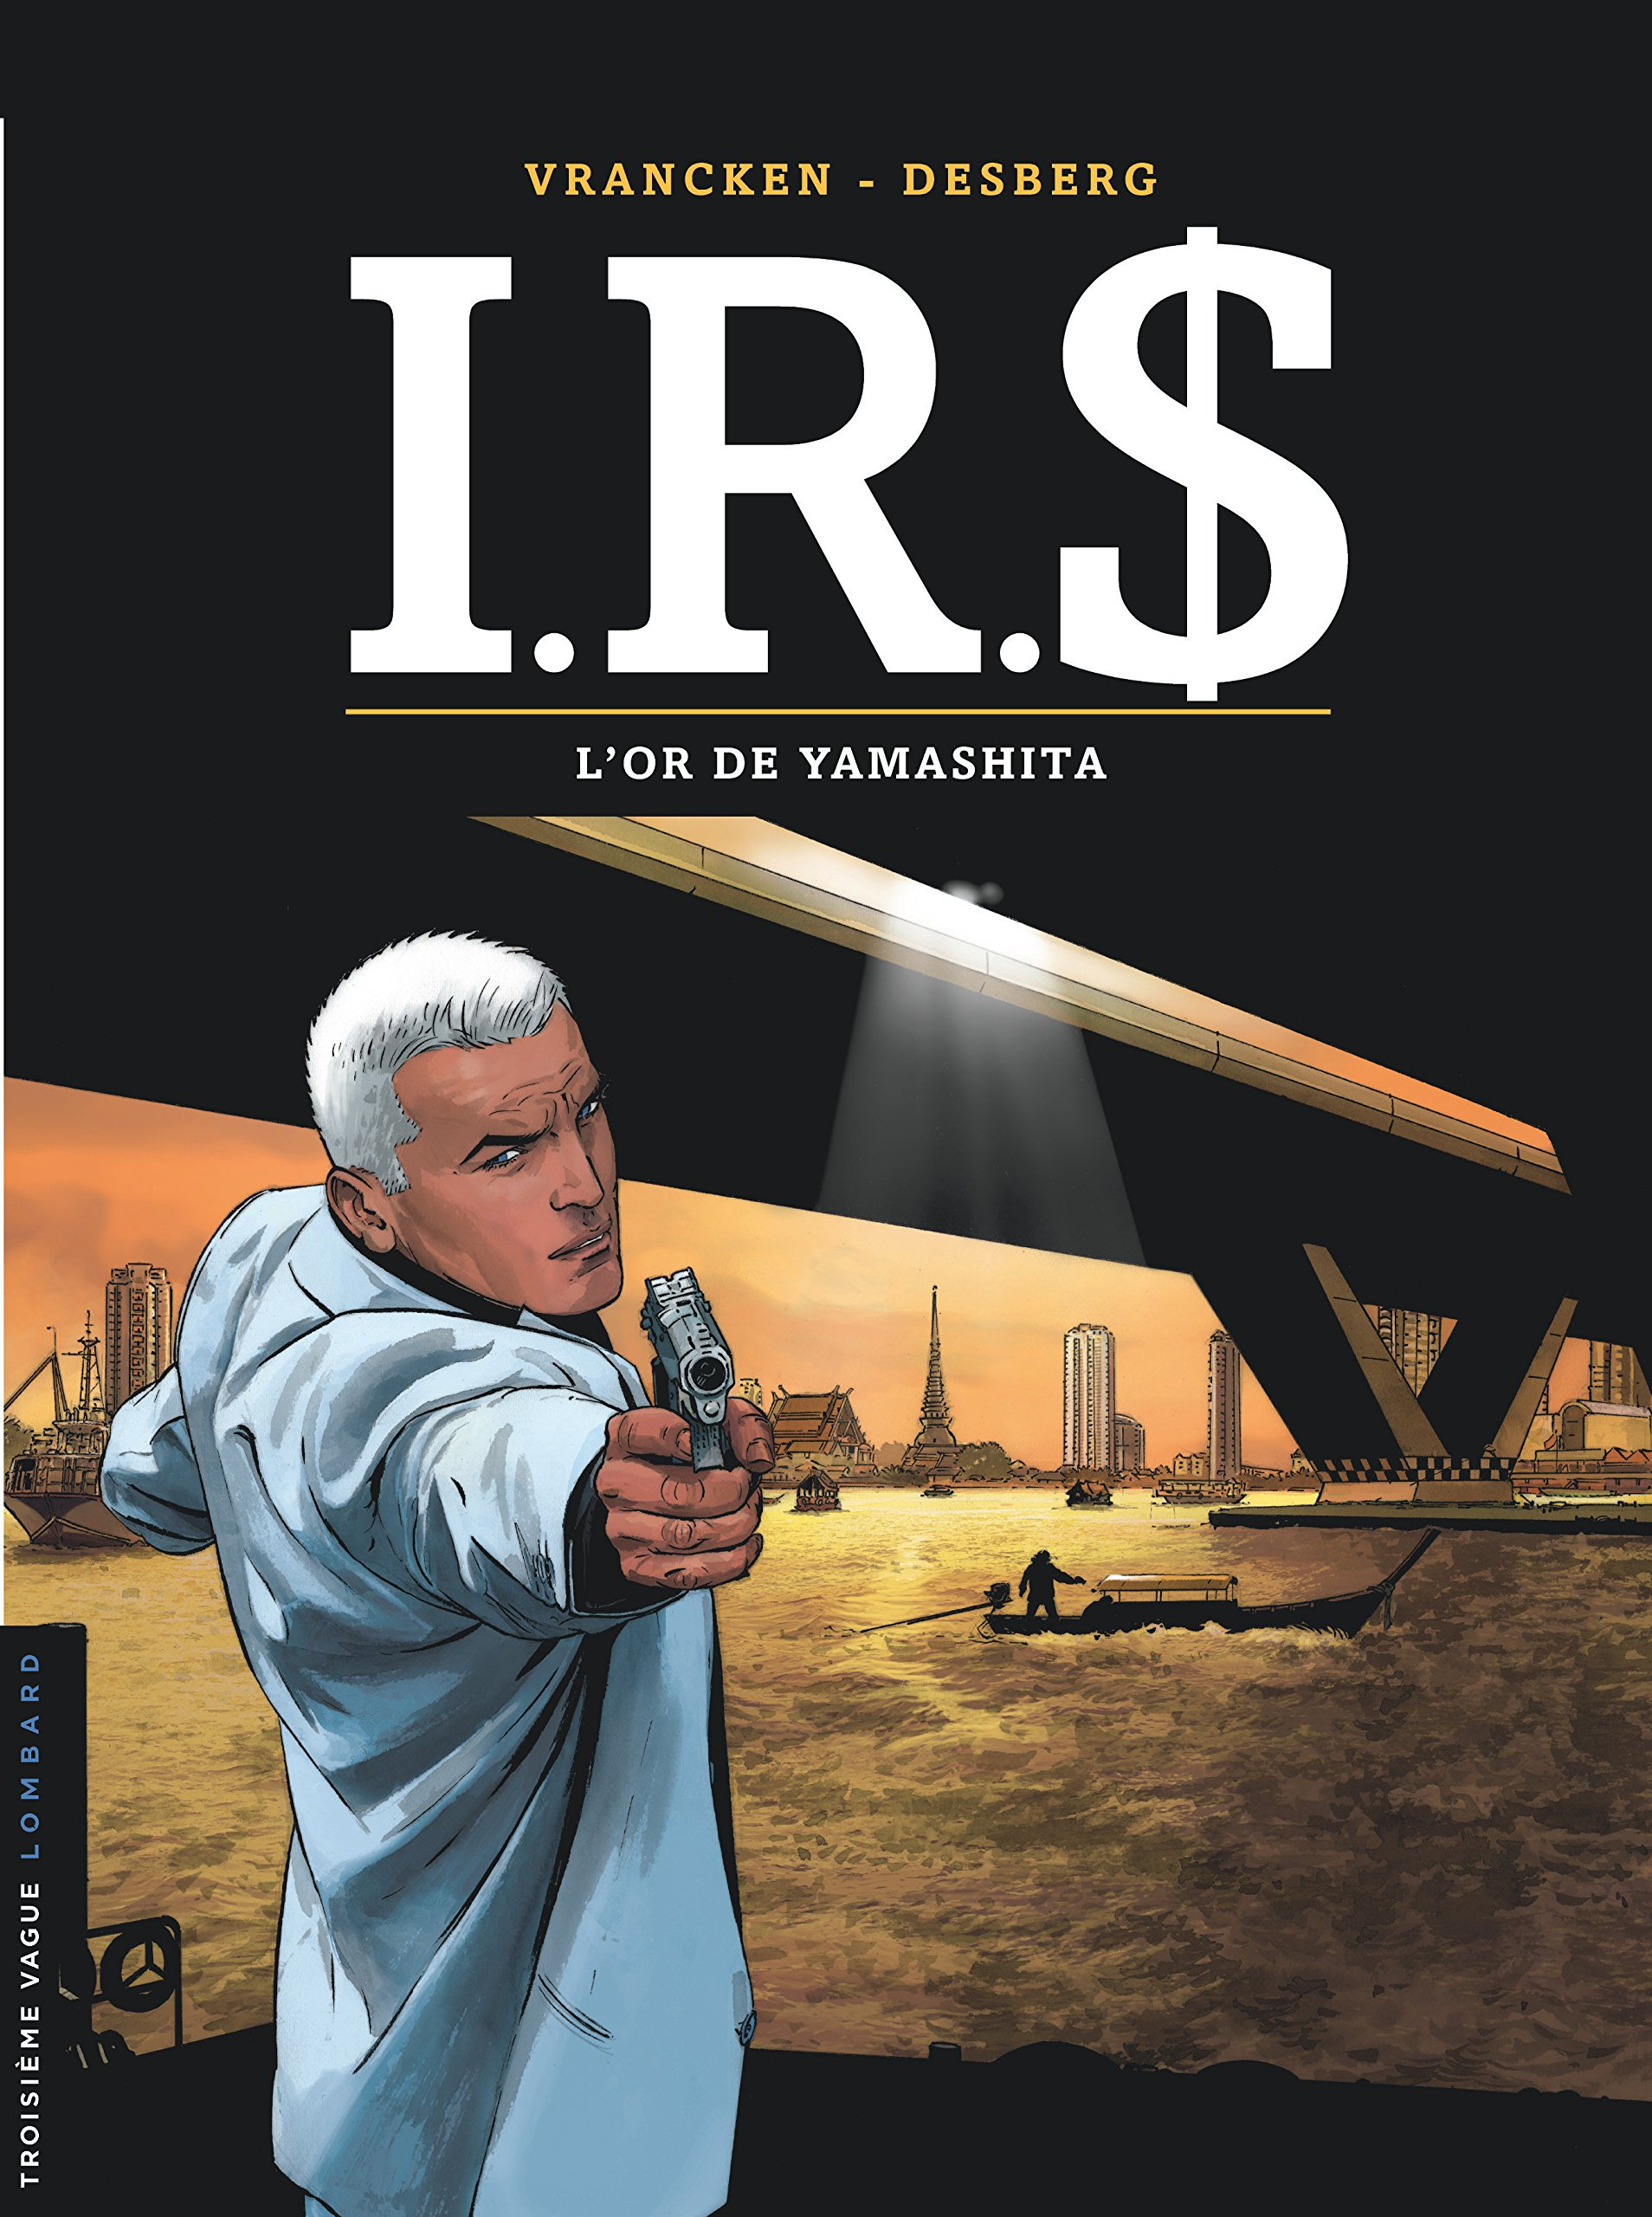 I.R.$ - tome 13 - L'or de Yamashita Relié – 30 juin 2011 Desberg Stephen Vrancken Le Lombard 2803628198